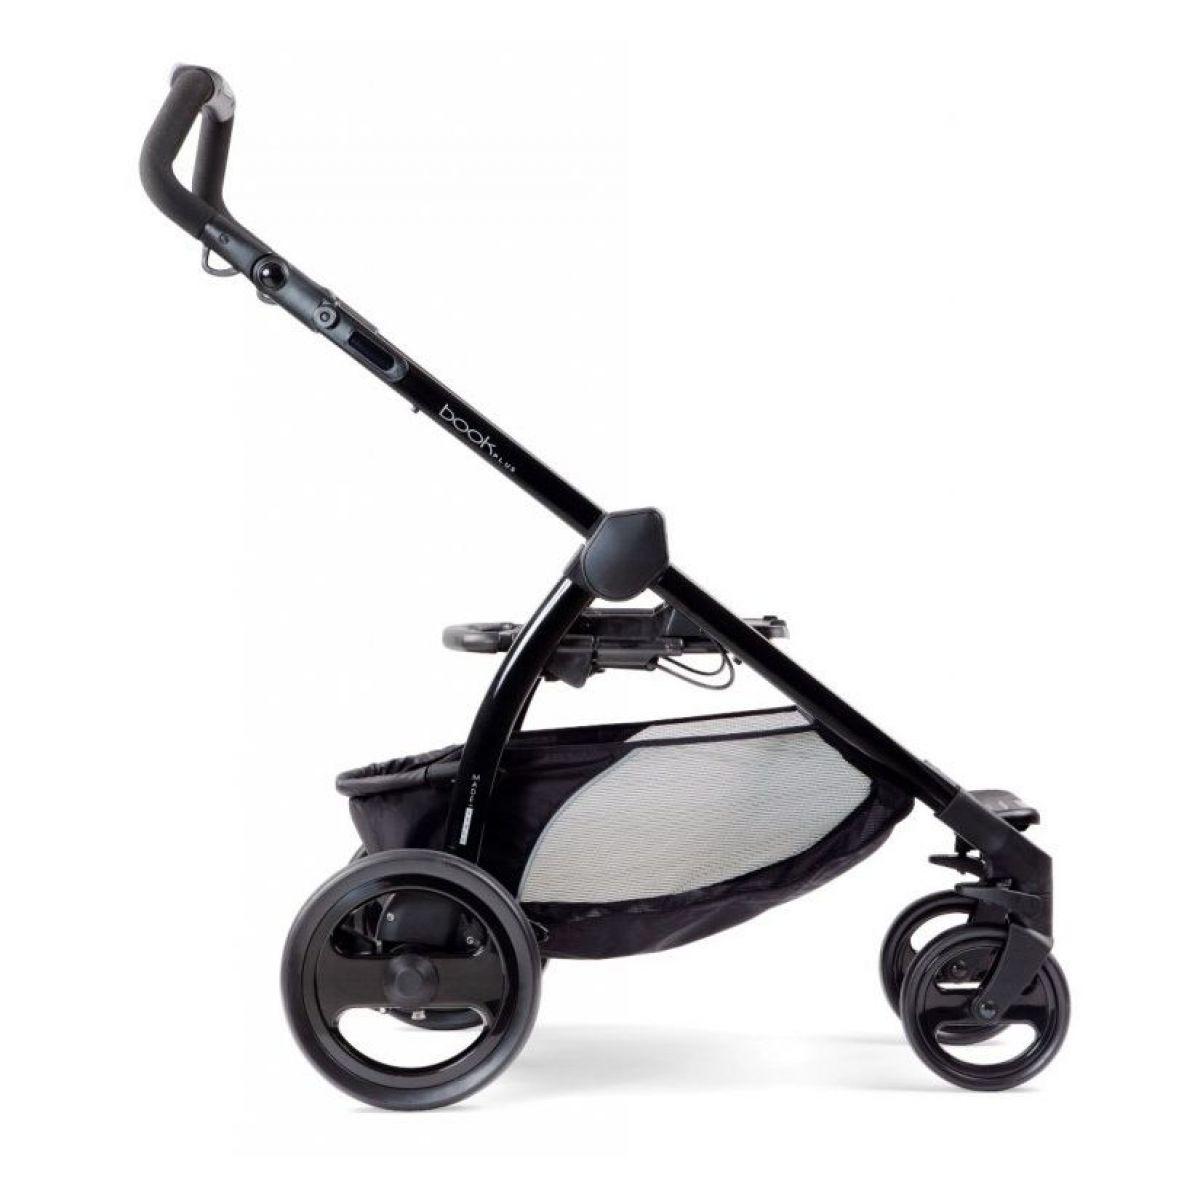 Petite & Mars Kočárek kombinovaný konstrukce Vario Universal Black